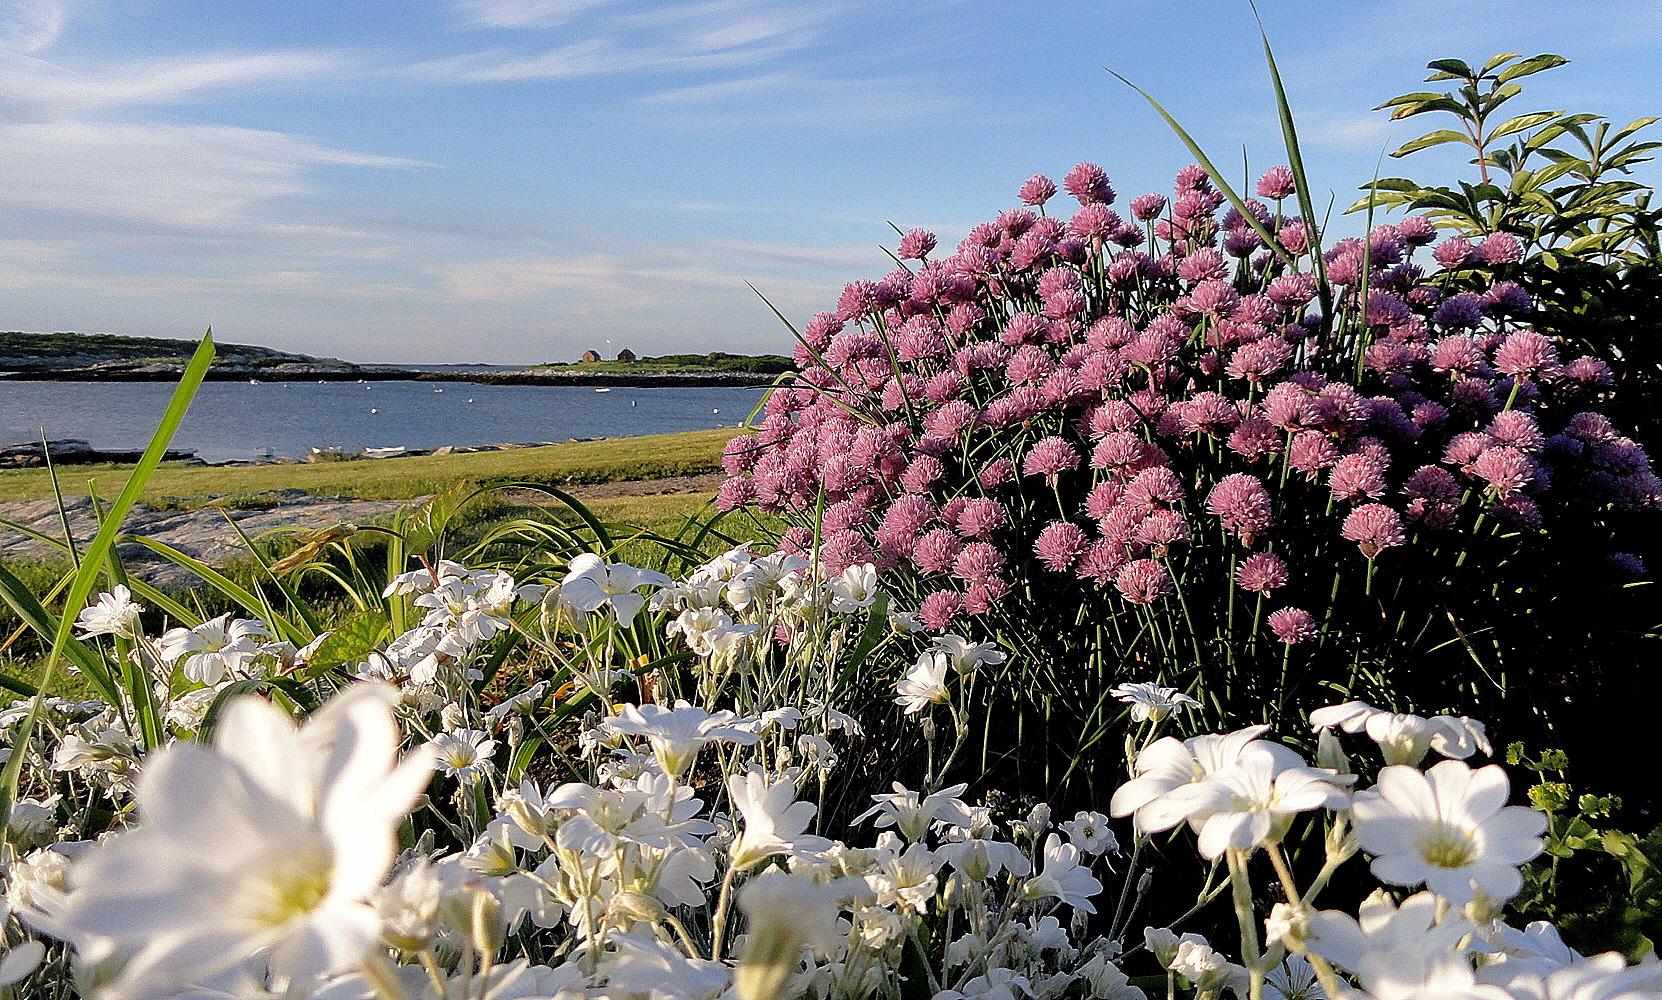 Massed Blossoms & Harbor 2